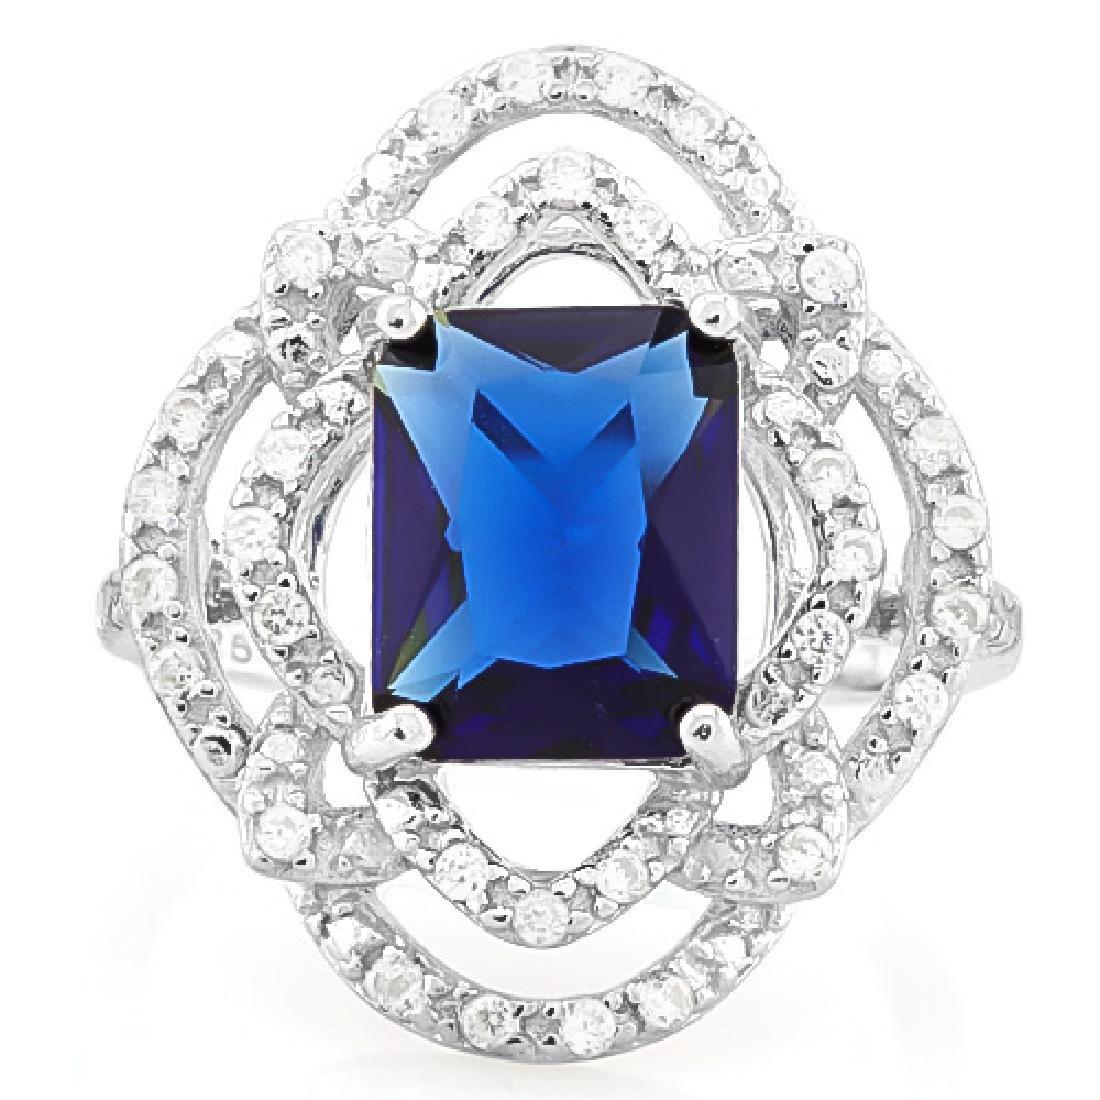 4.00 CT CREATED BLUE SAPPHIRE & 40PCS CREATED DIAMOND 9